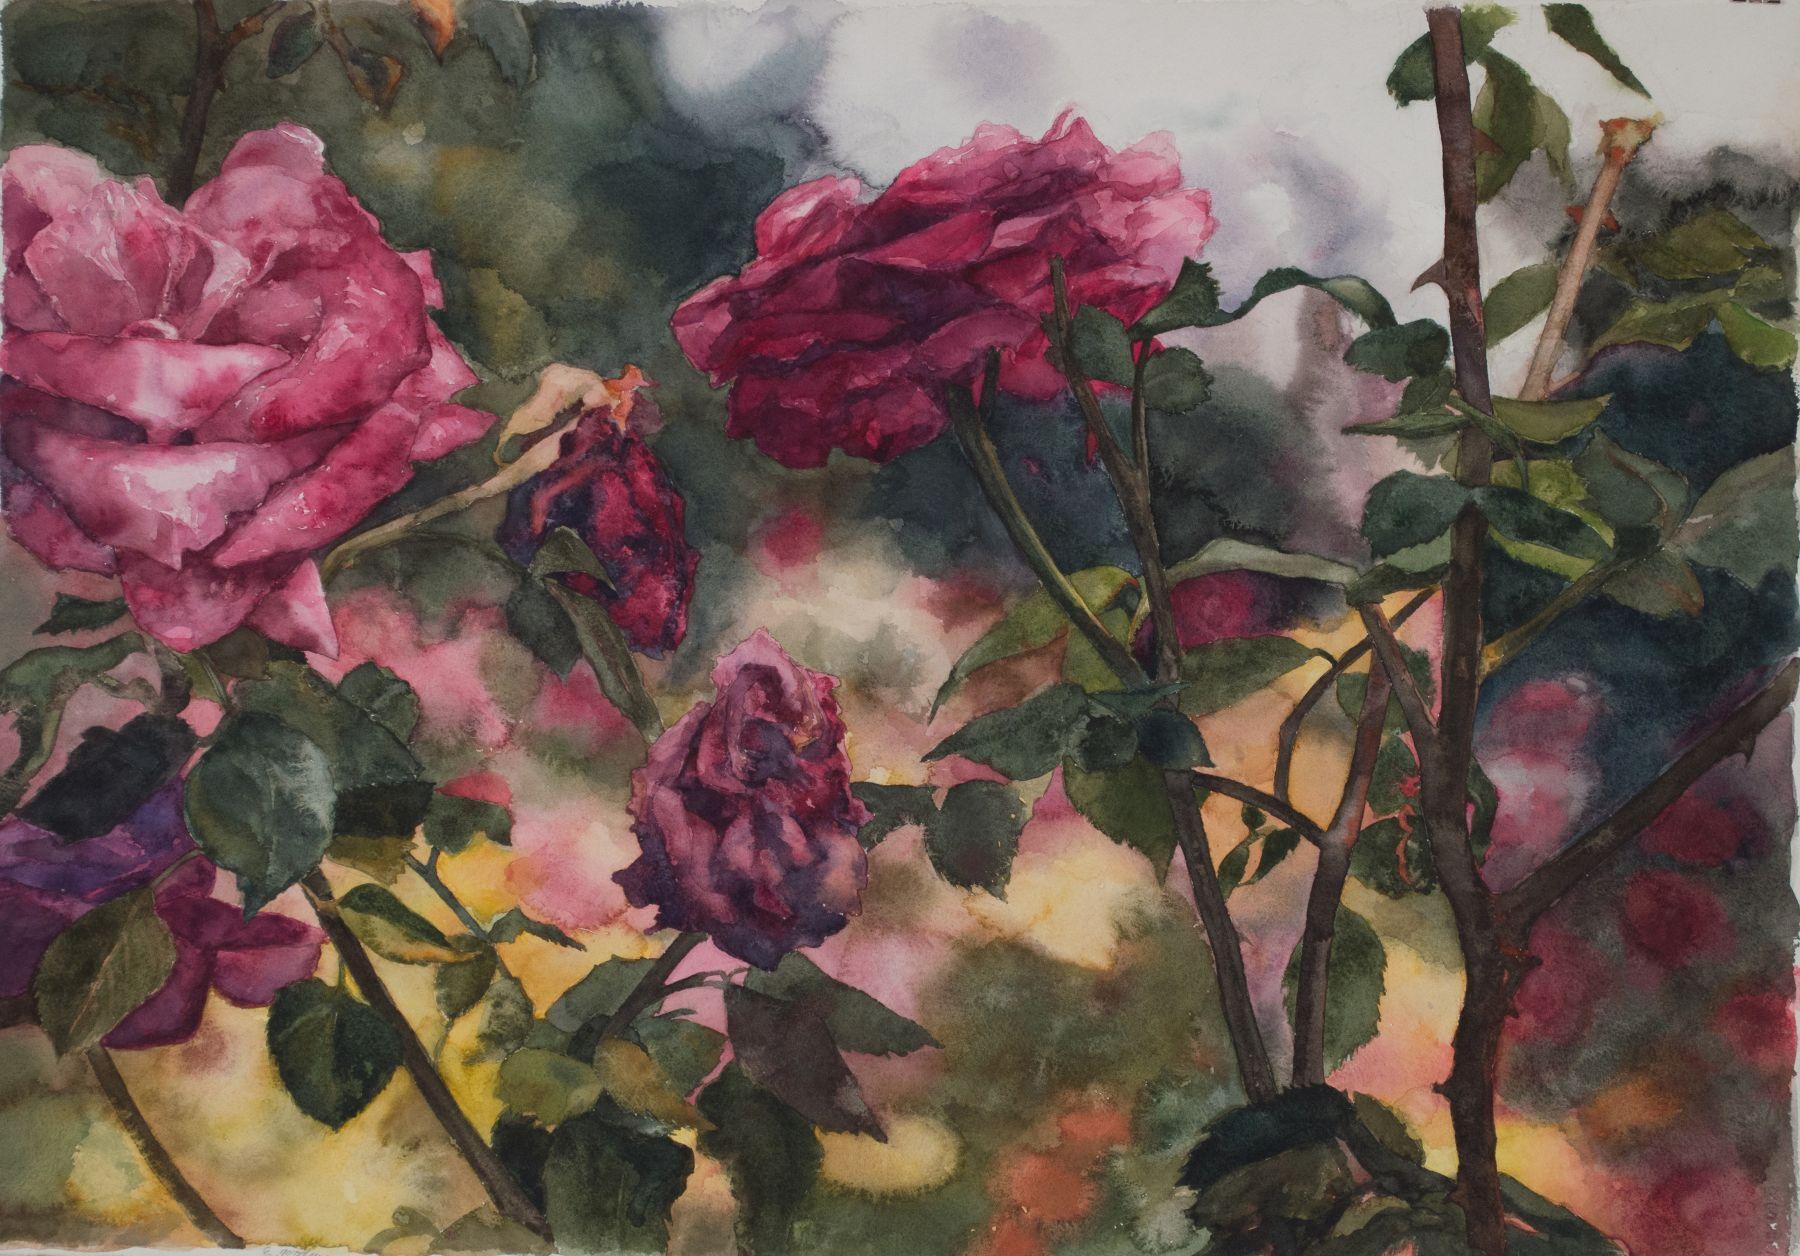 Roses In Front, Eileen Goodman, Watercolor